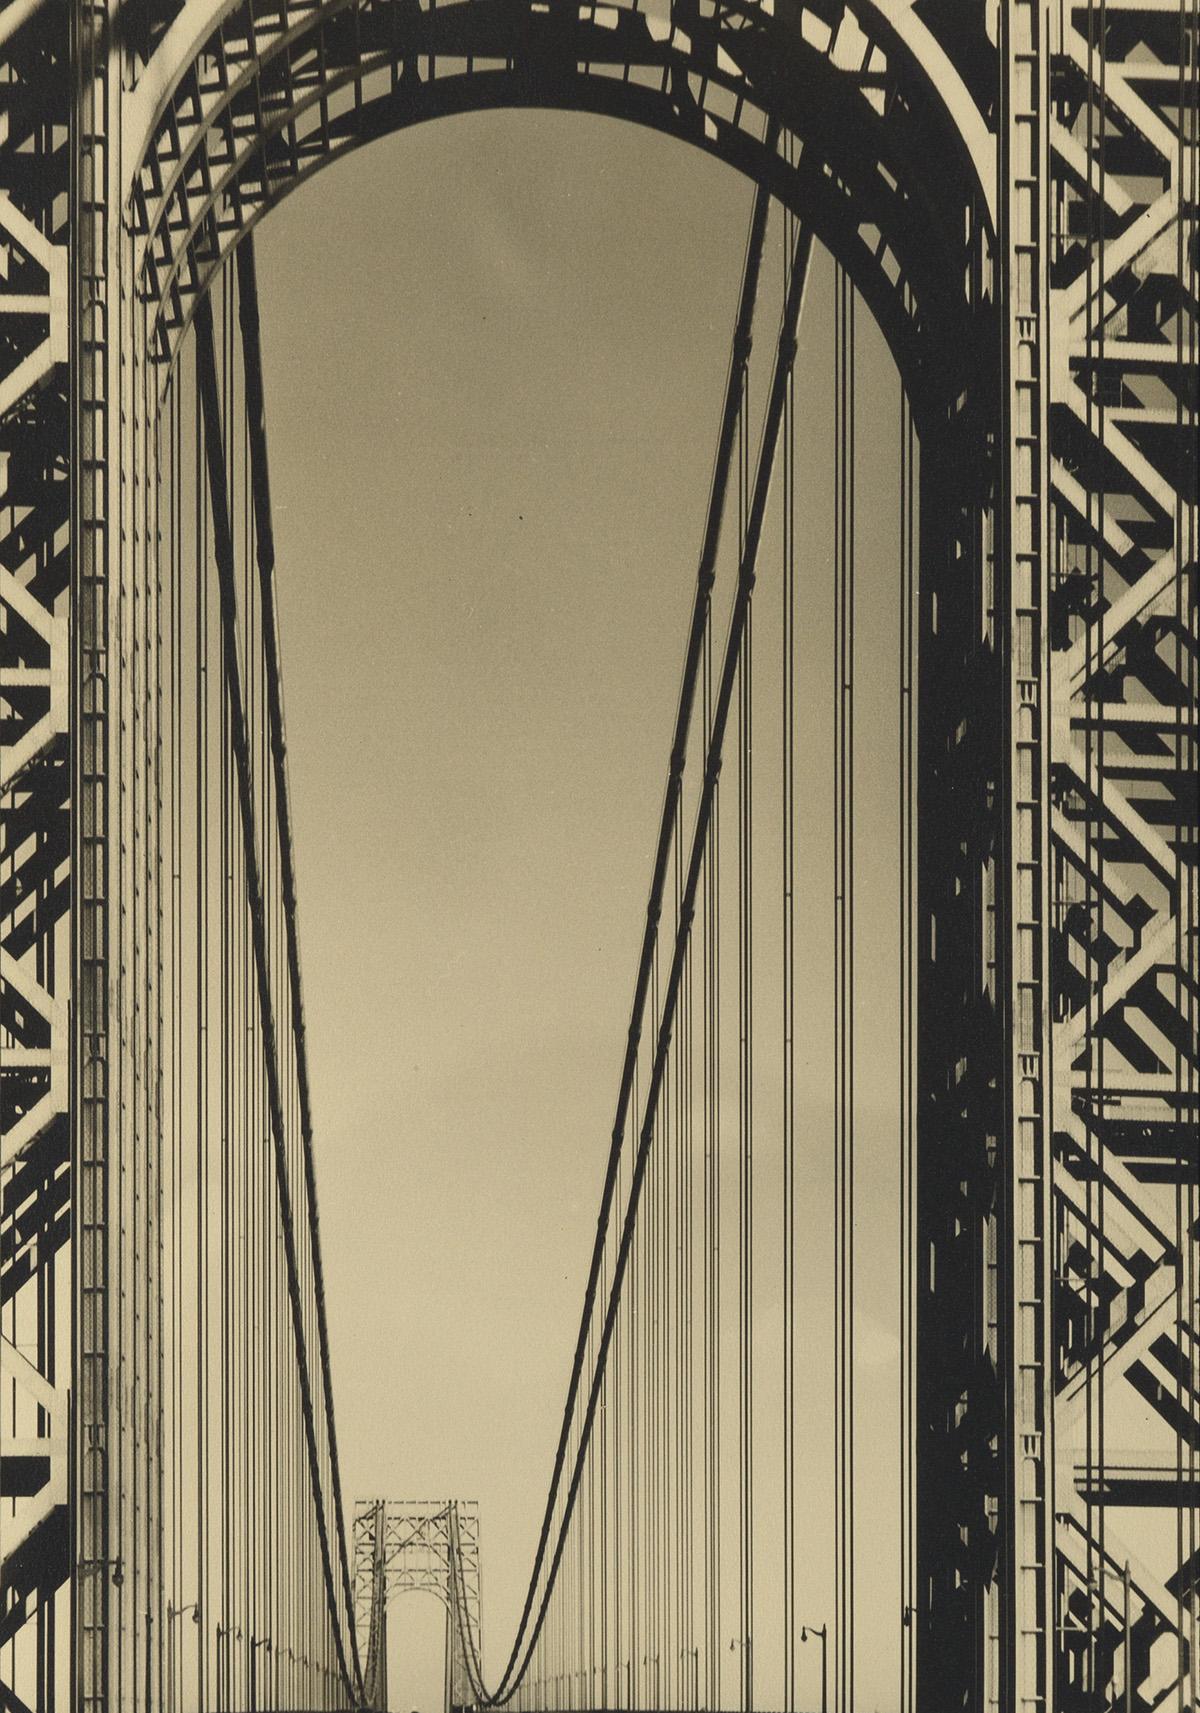 MARGARET BOURKE-WHITE (1904-1971) The George Washington Bridge.